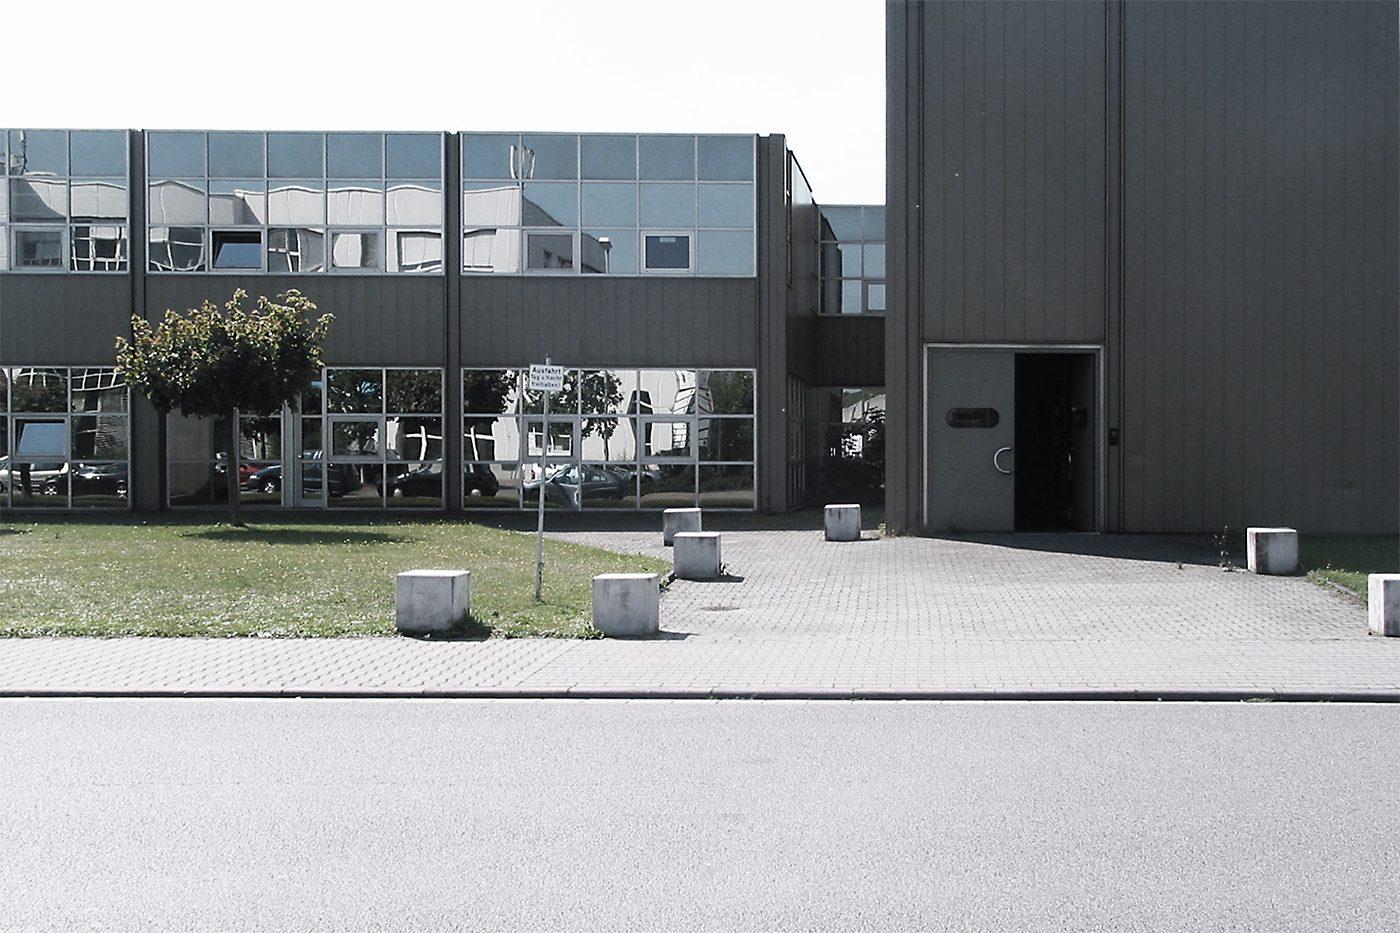 parker aerospace